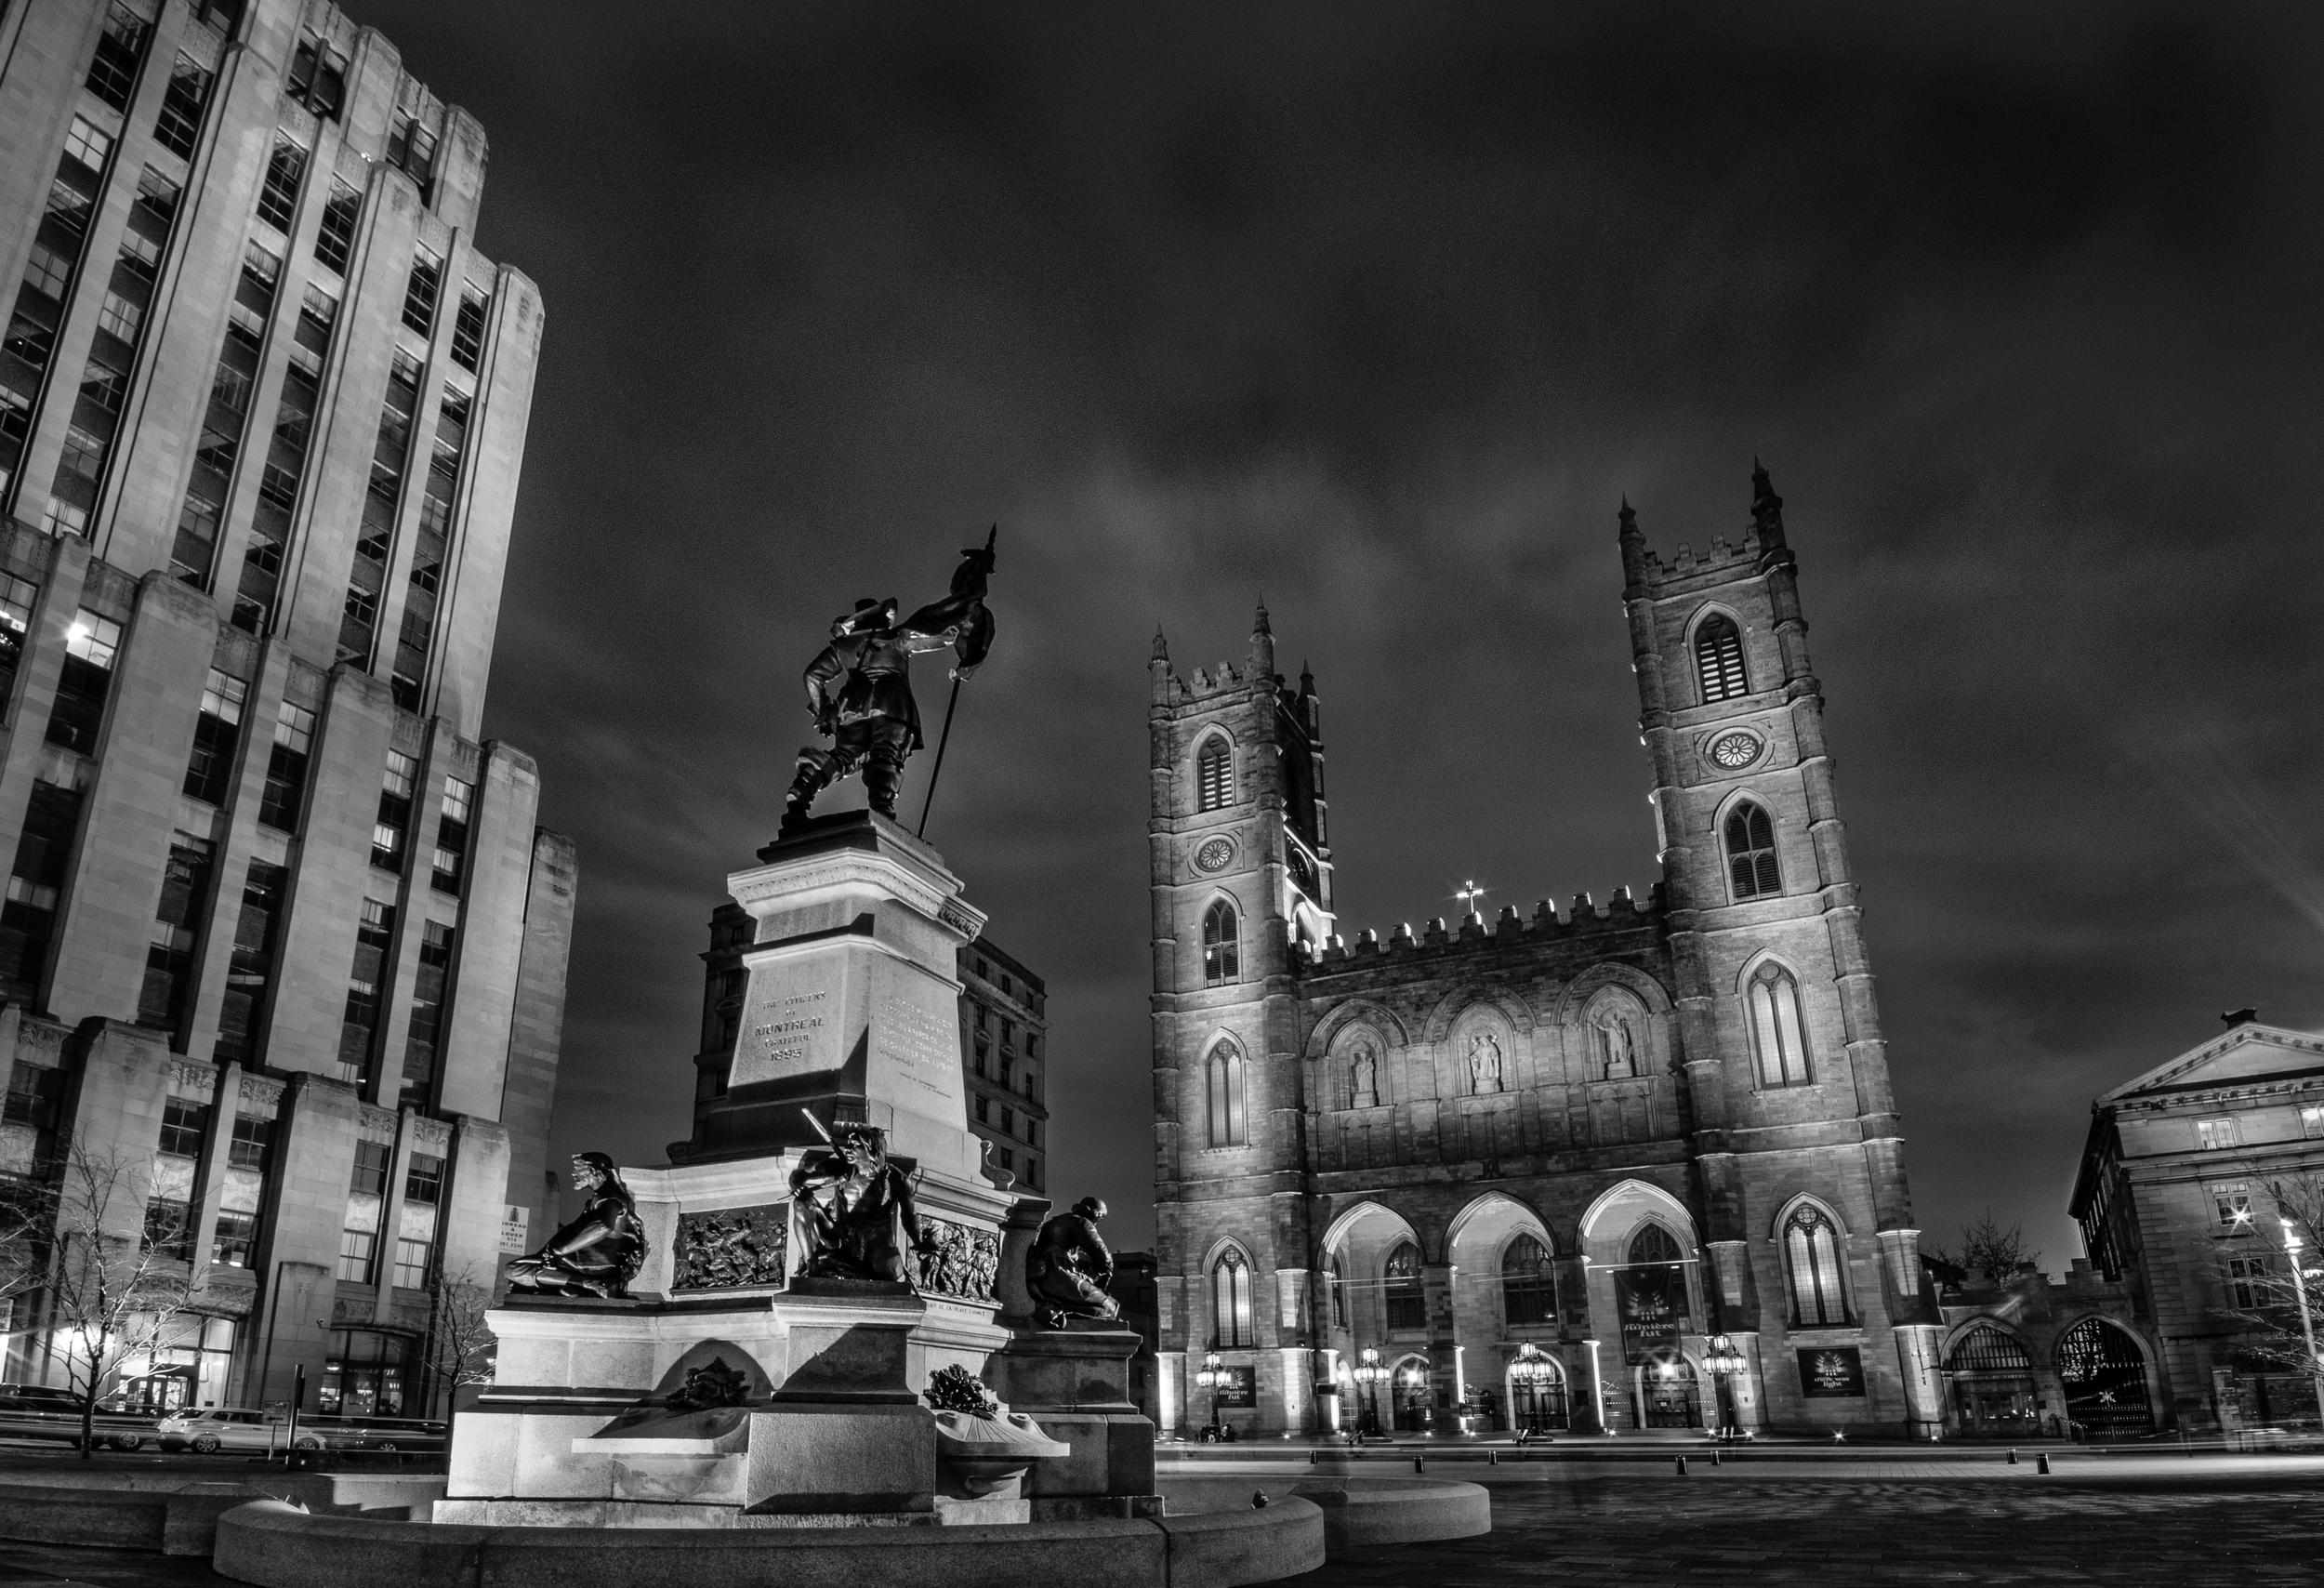 Notre_Dame_Basilica_BW_No Warp.jpg